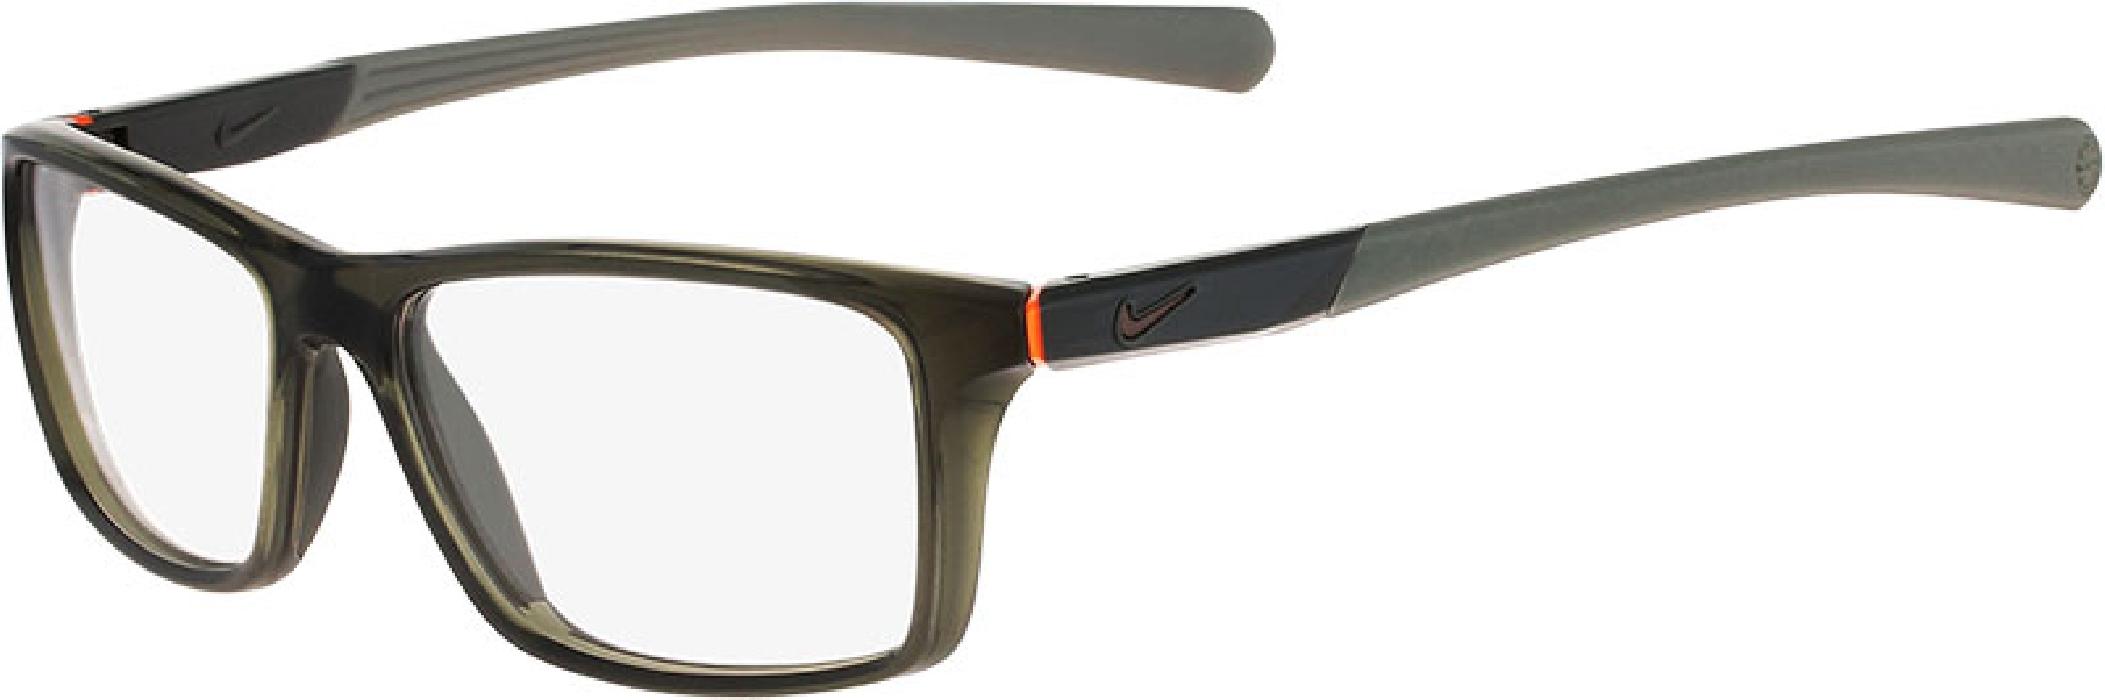 An image of Nike 7087 Cargo Khaki/Total Orange